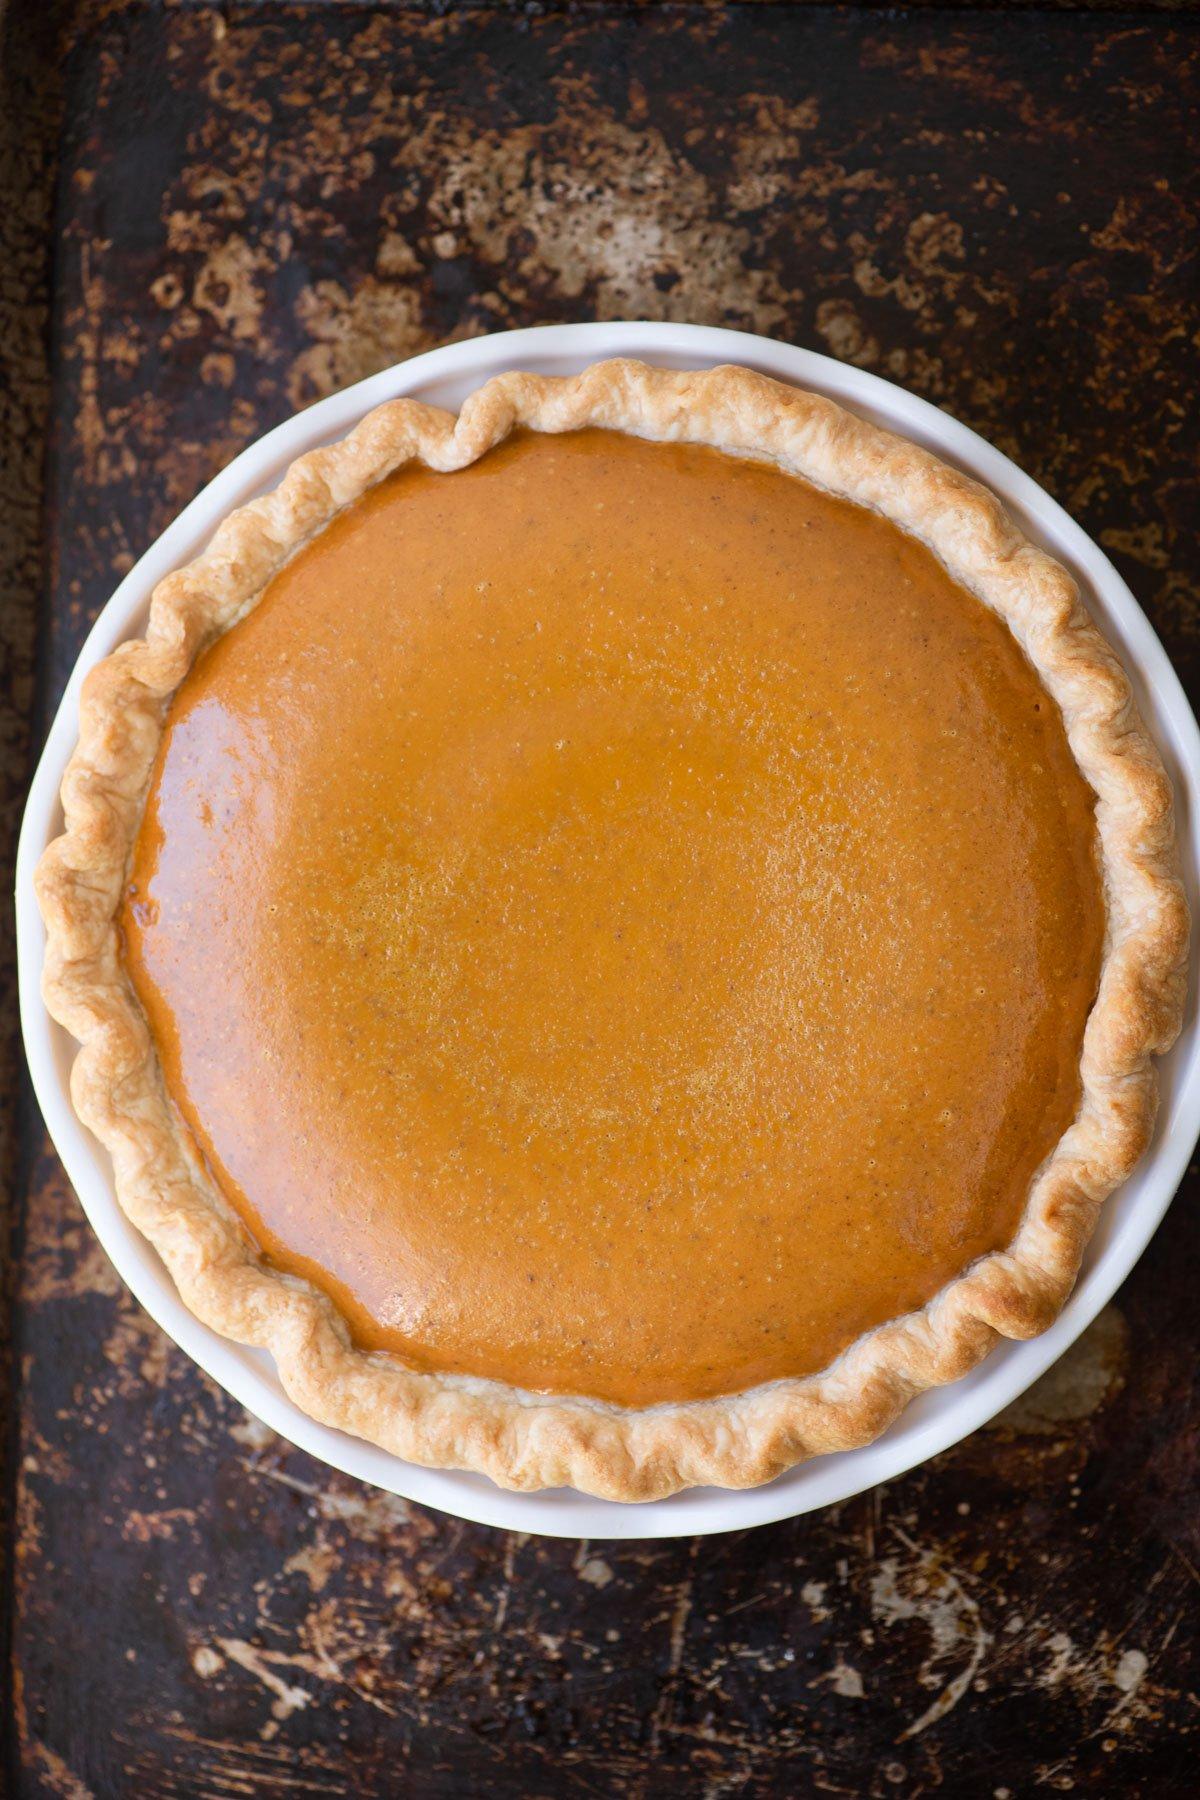 Libbys Pumpkin Pie recipe